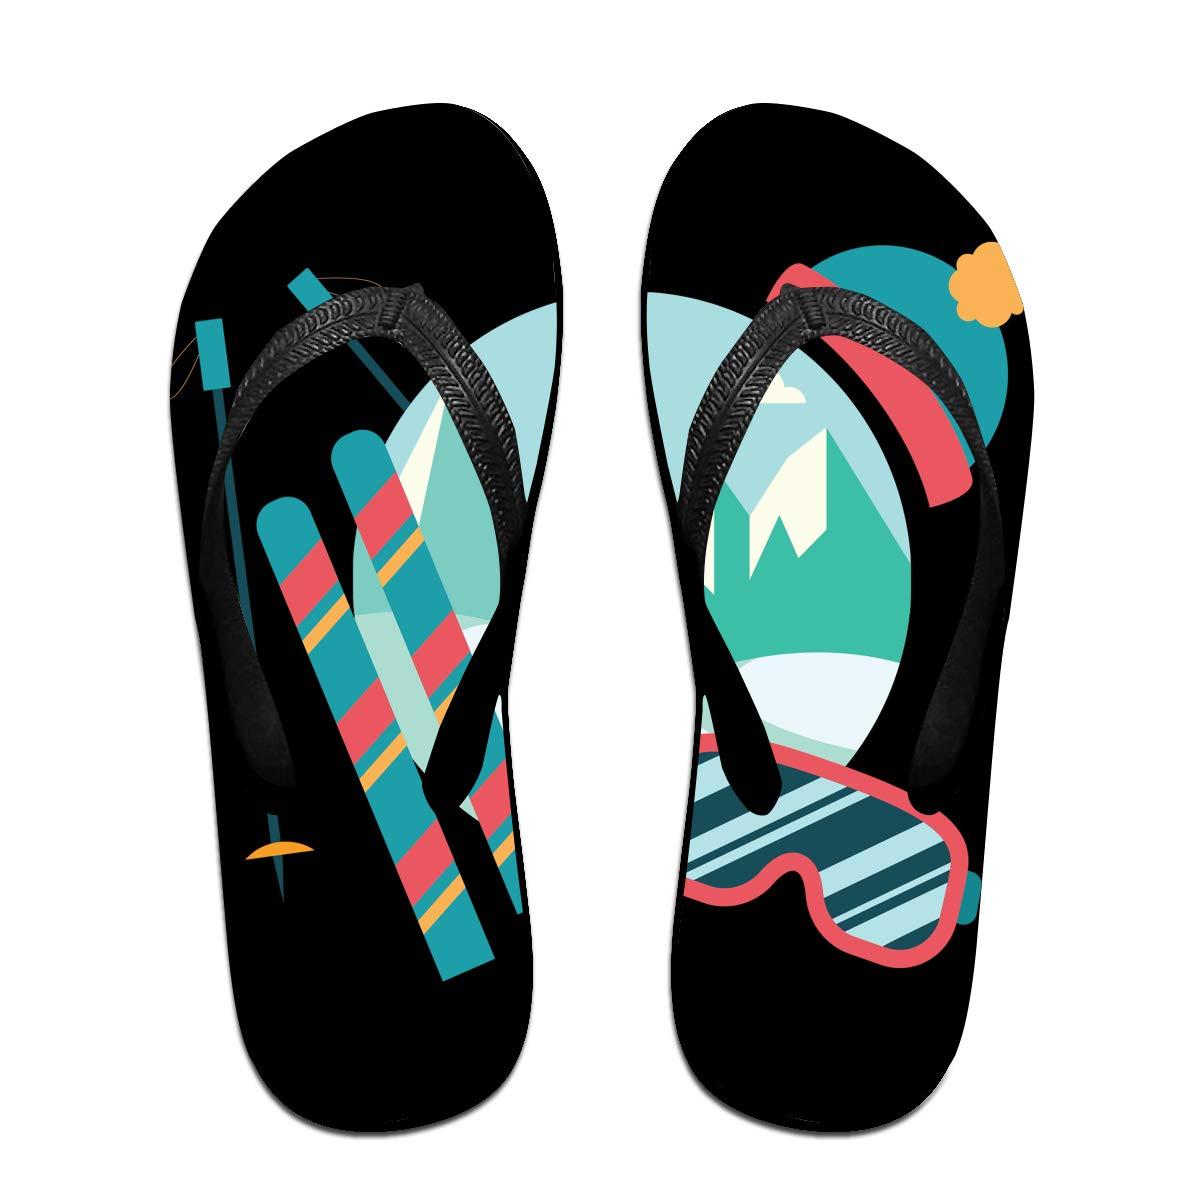 Couple Slipper Skiing Equipment Print Flip Flops Unisex Chic Sandals Rubber Non-Slip Beach Thong Slippers